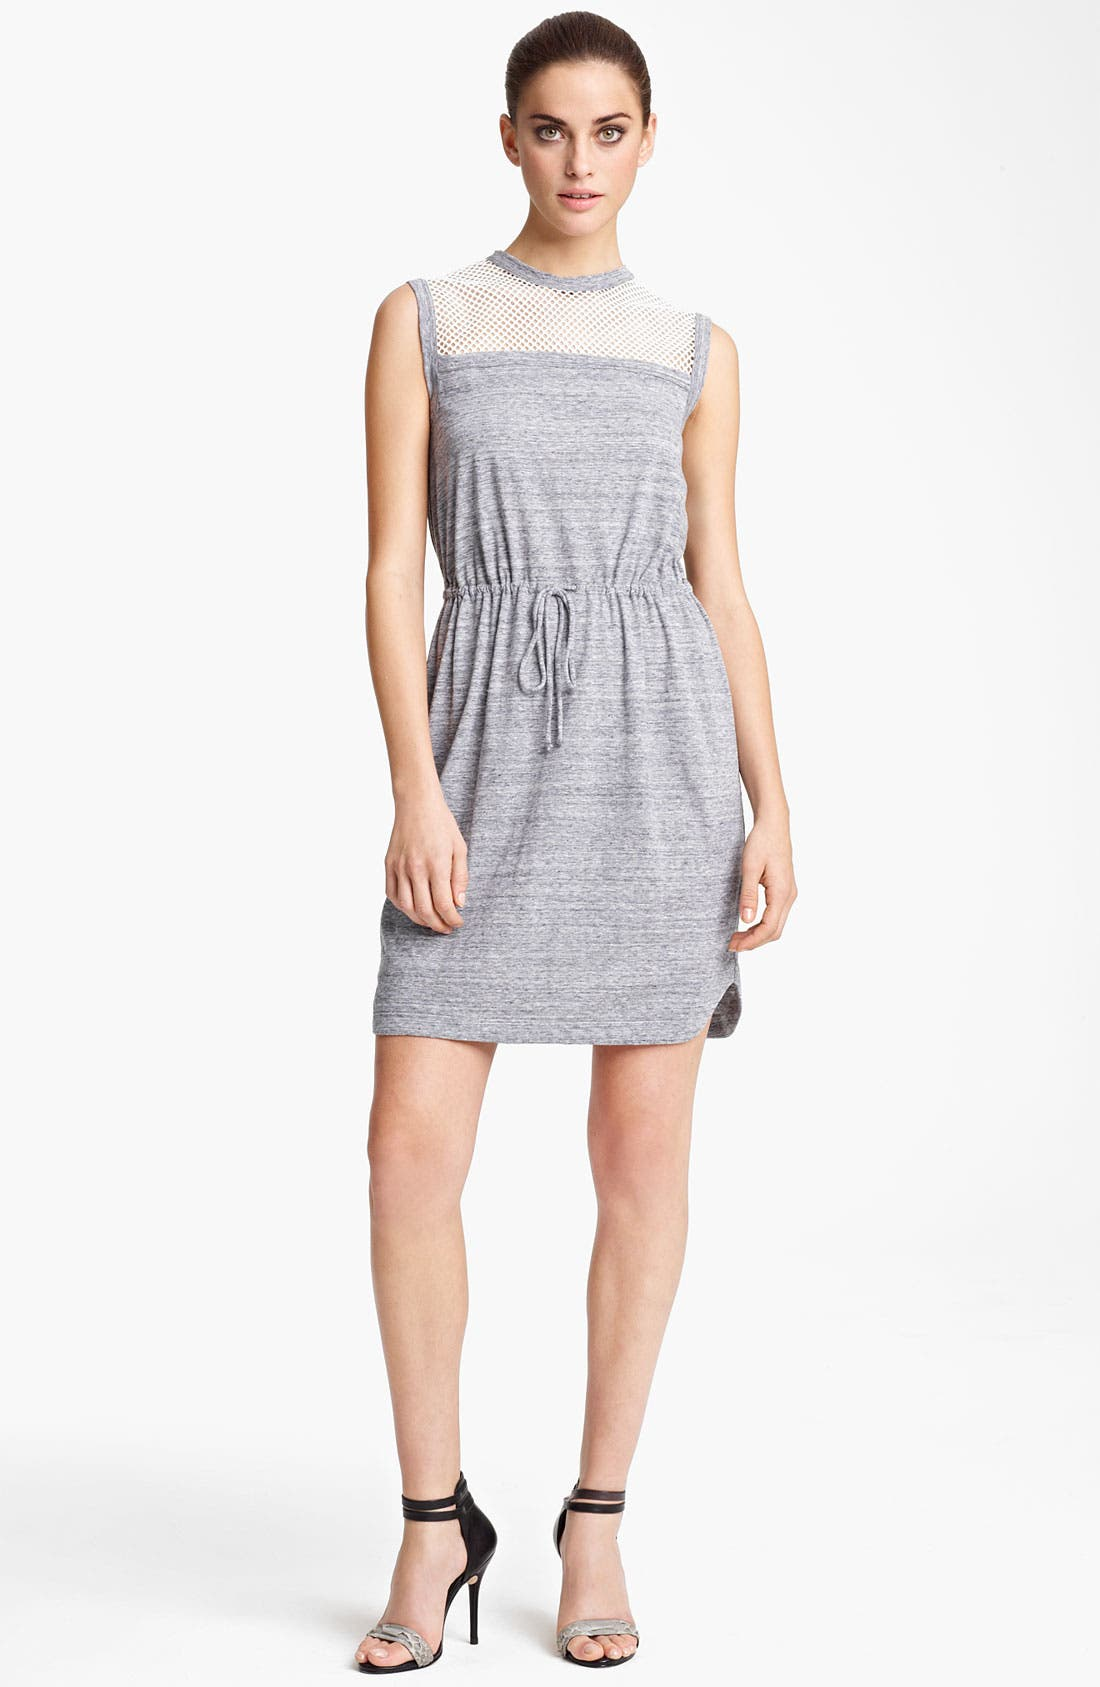 Main Image - Yigal Azrouël Sleeveless Jersey Dress